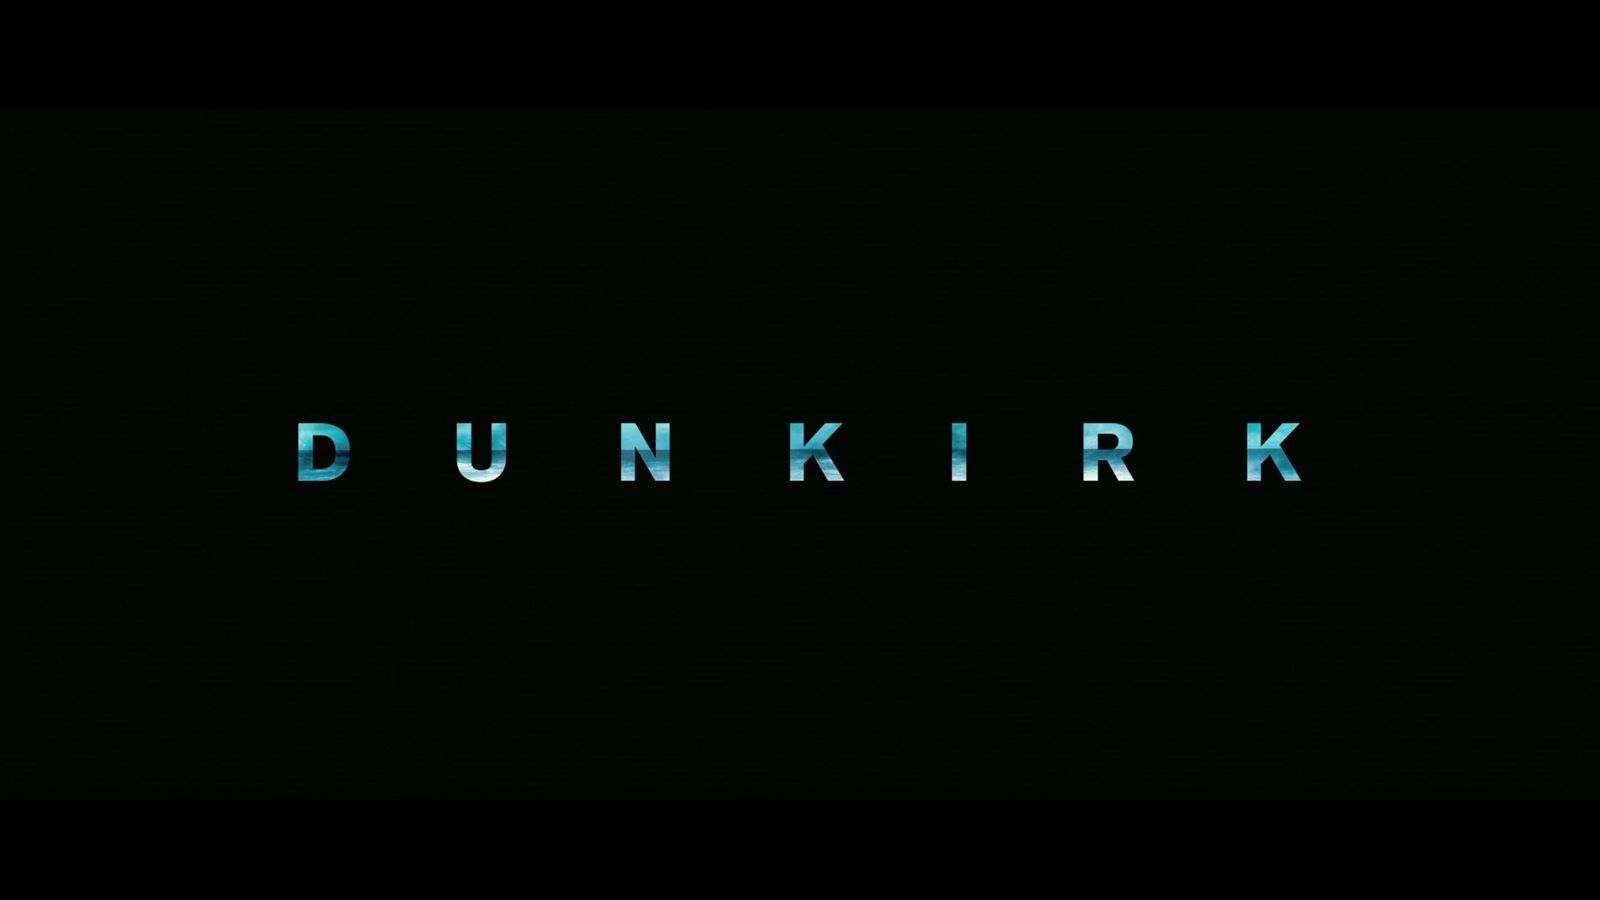 Tràiler de 'Dunkirk', el film bèl·lic de Christopher Nolan